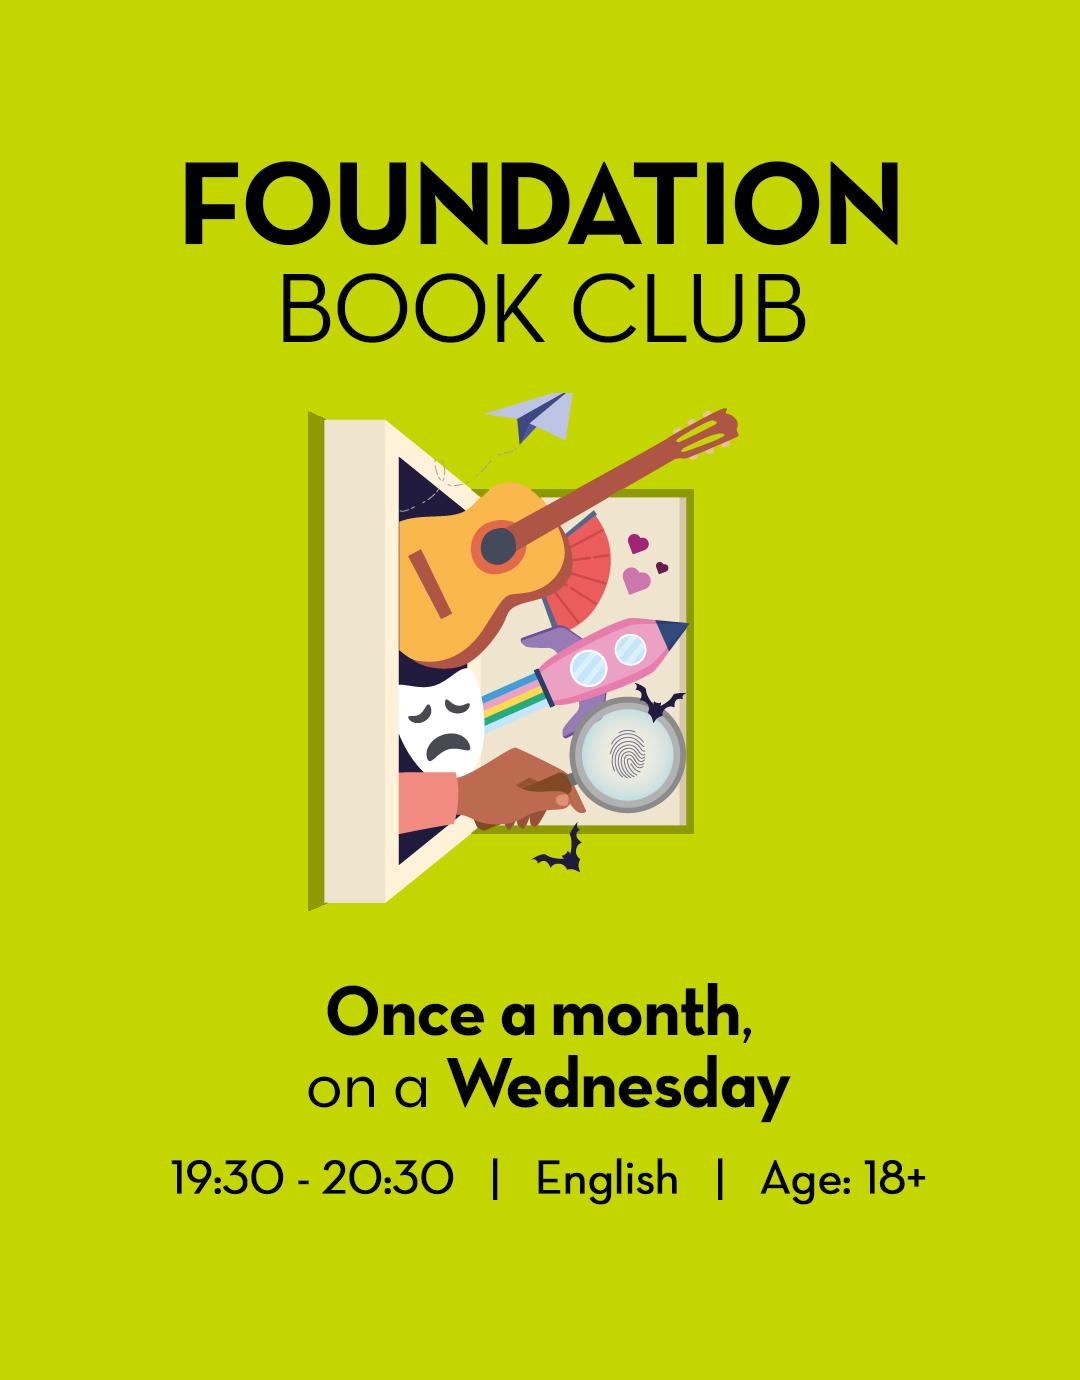 Emirates Literature Foundation Book Club Details